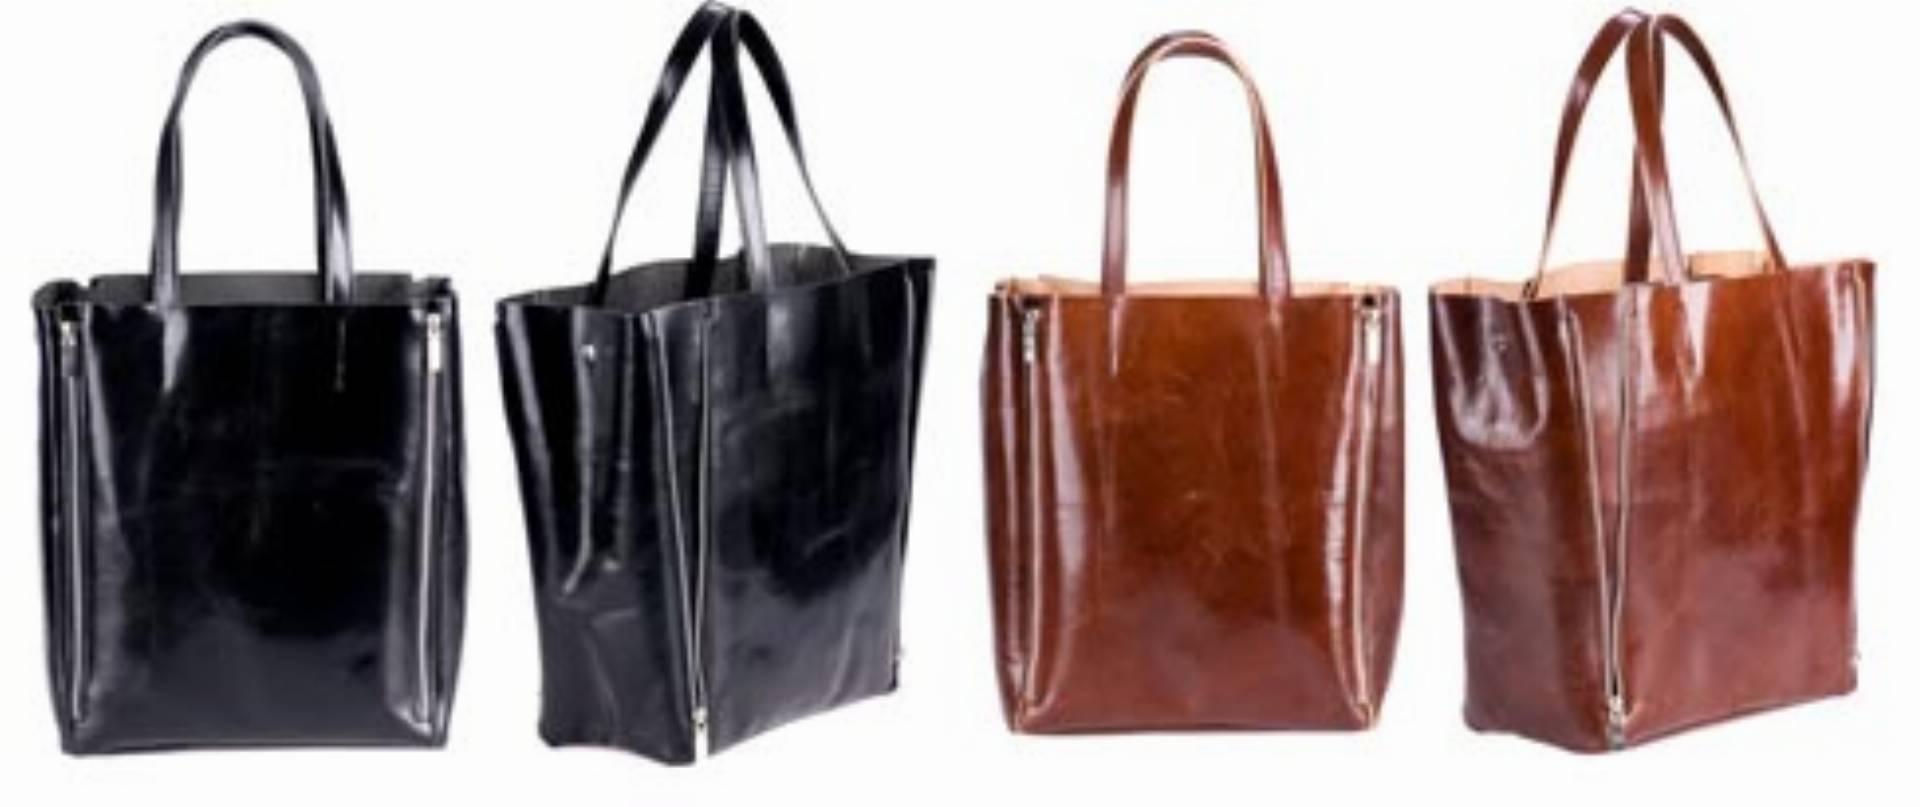 Shopping bags Anataka